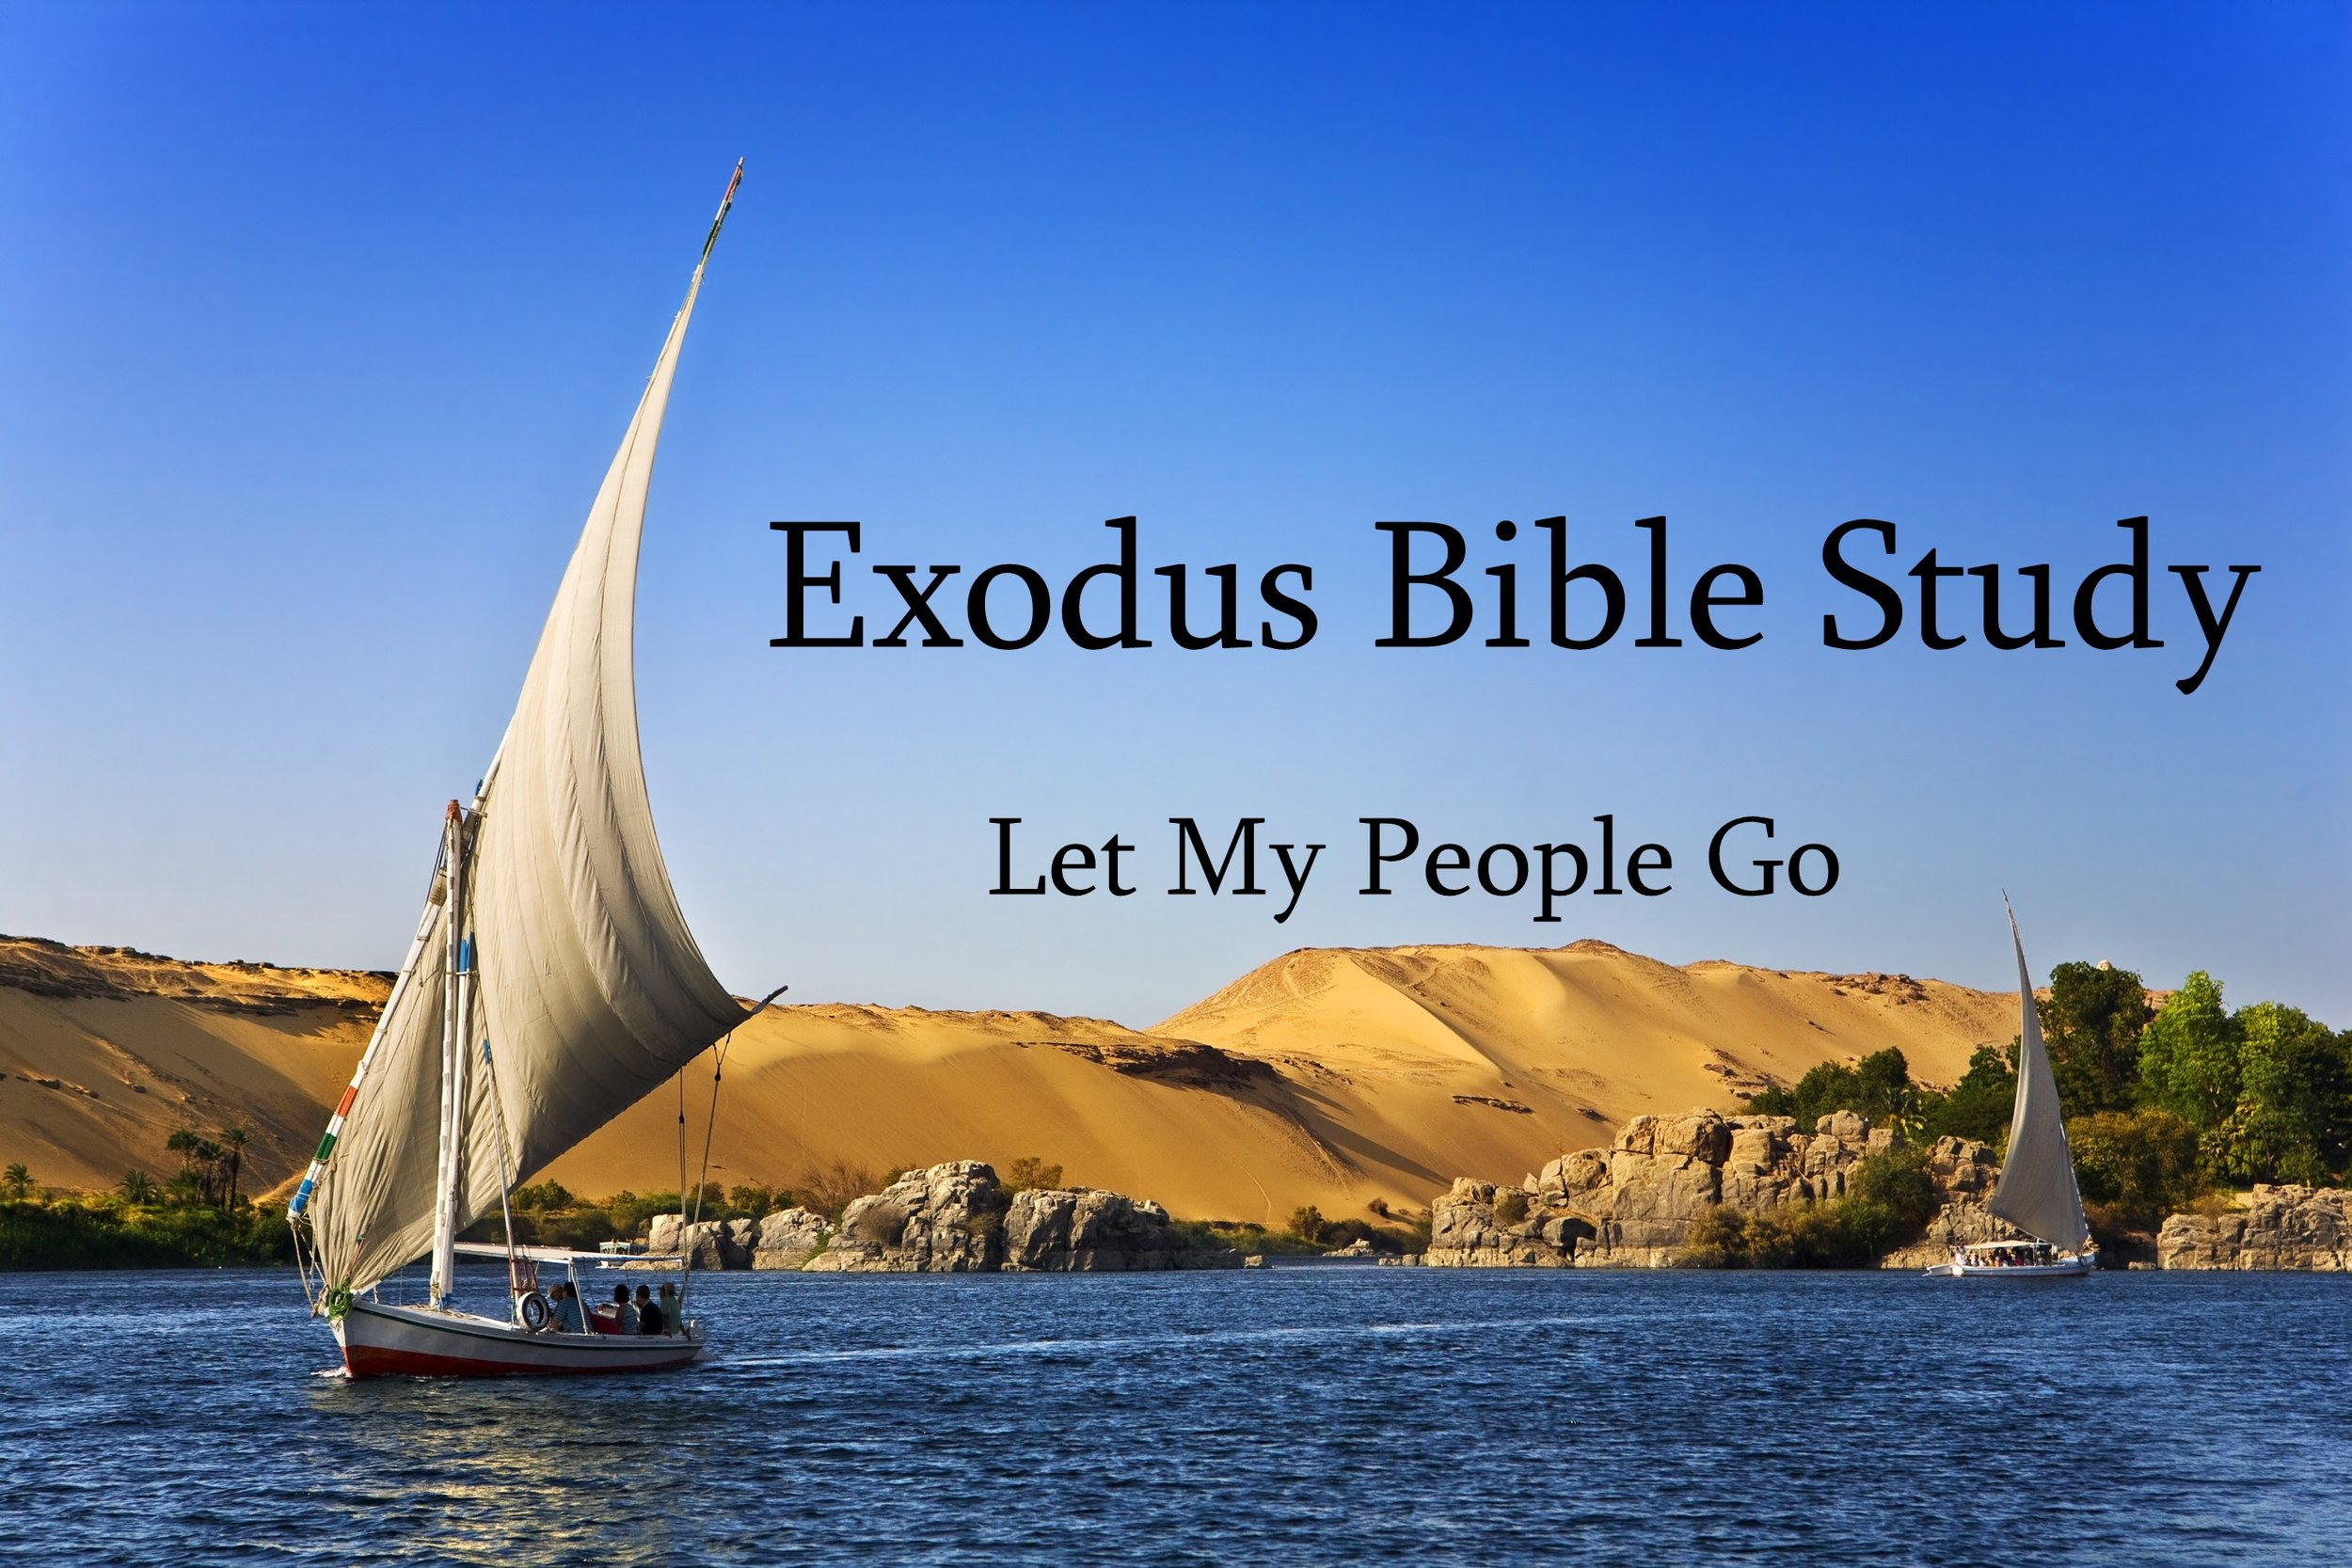 Exodus-Bible-Study-Banner-Image